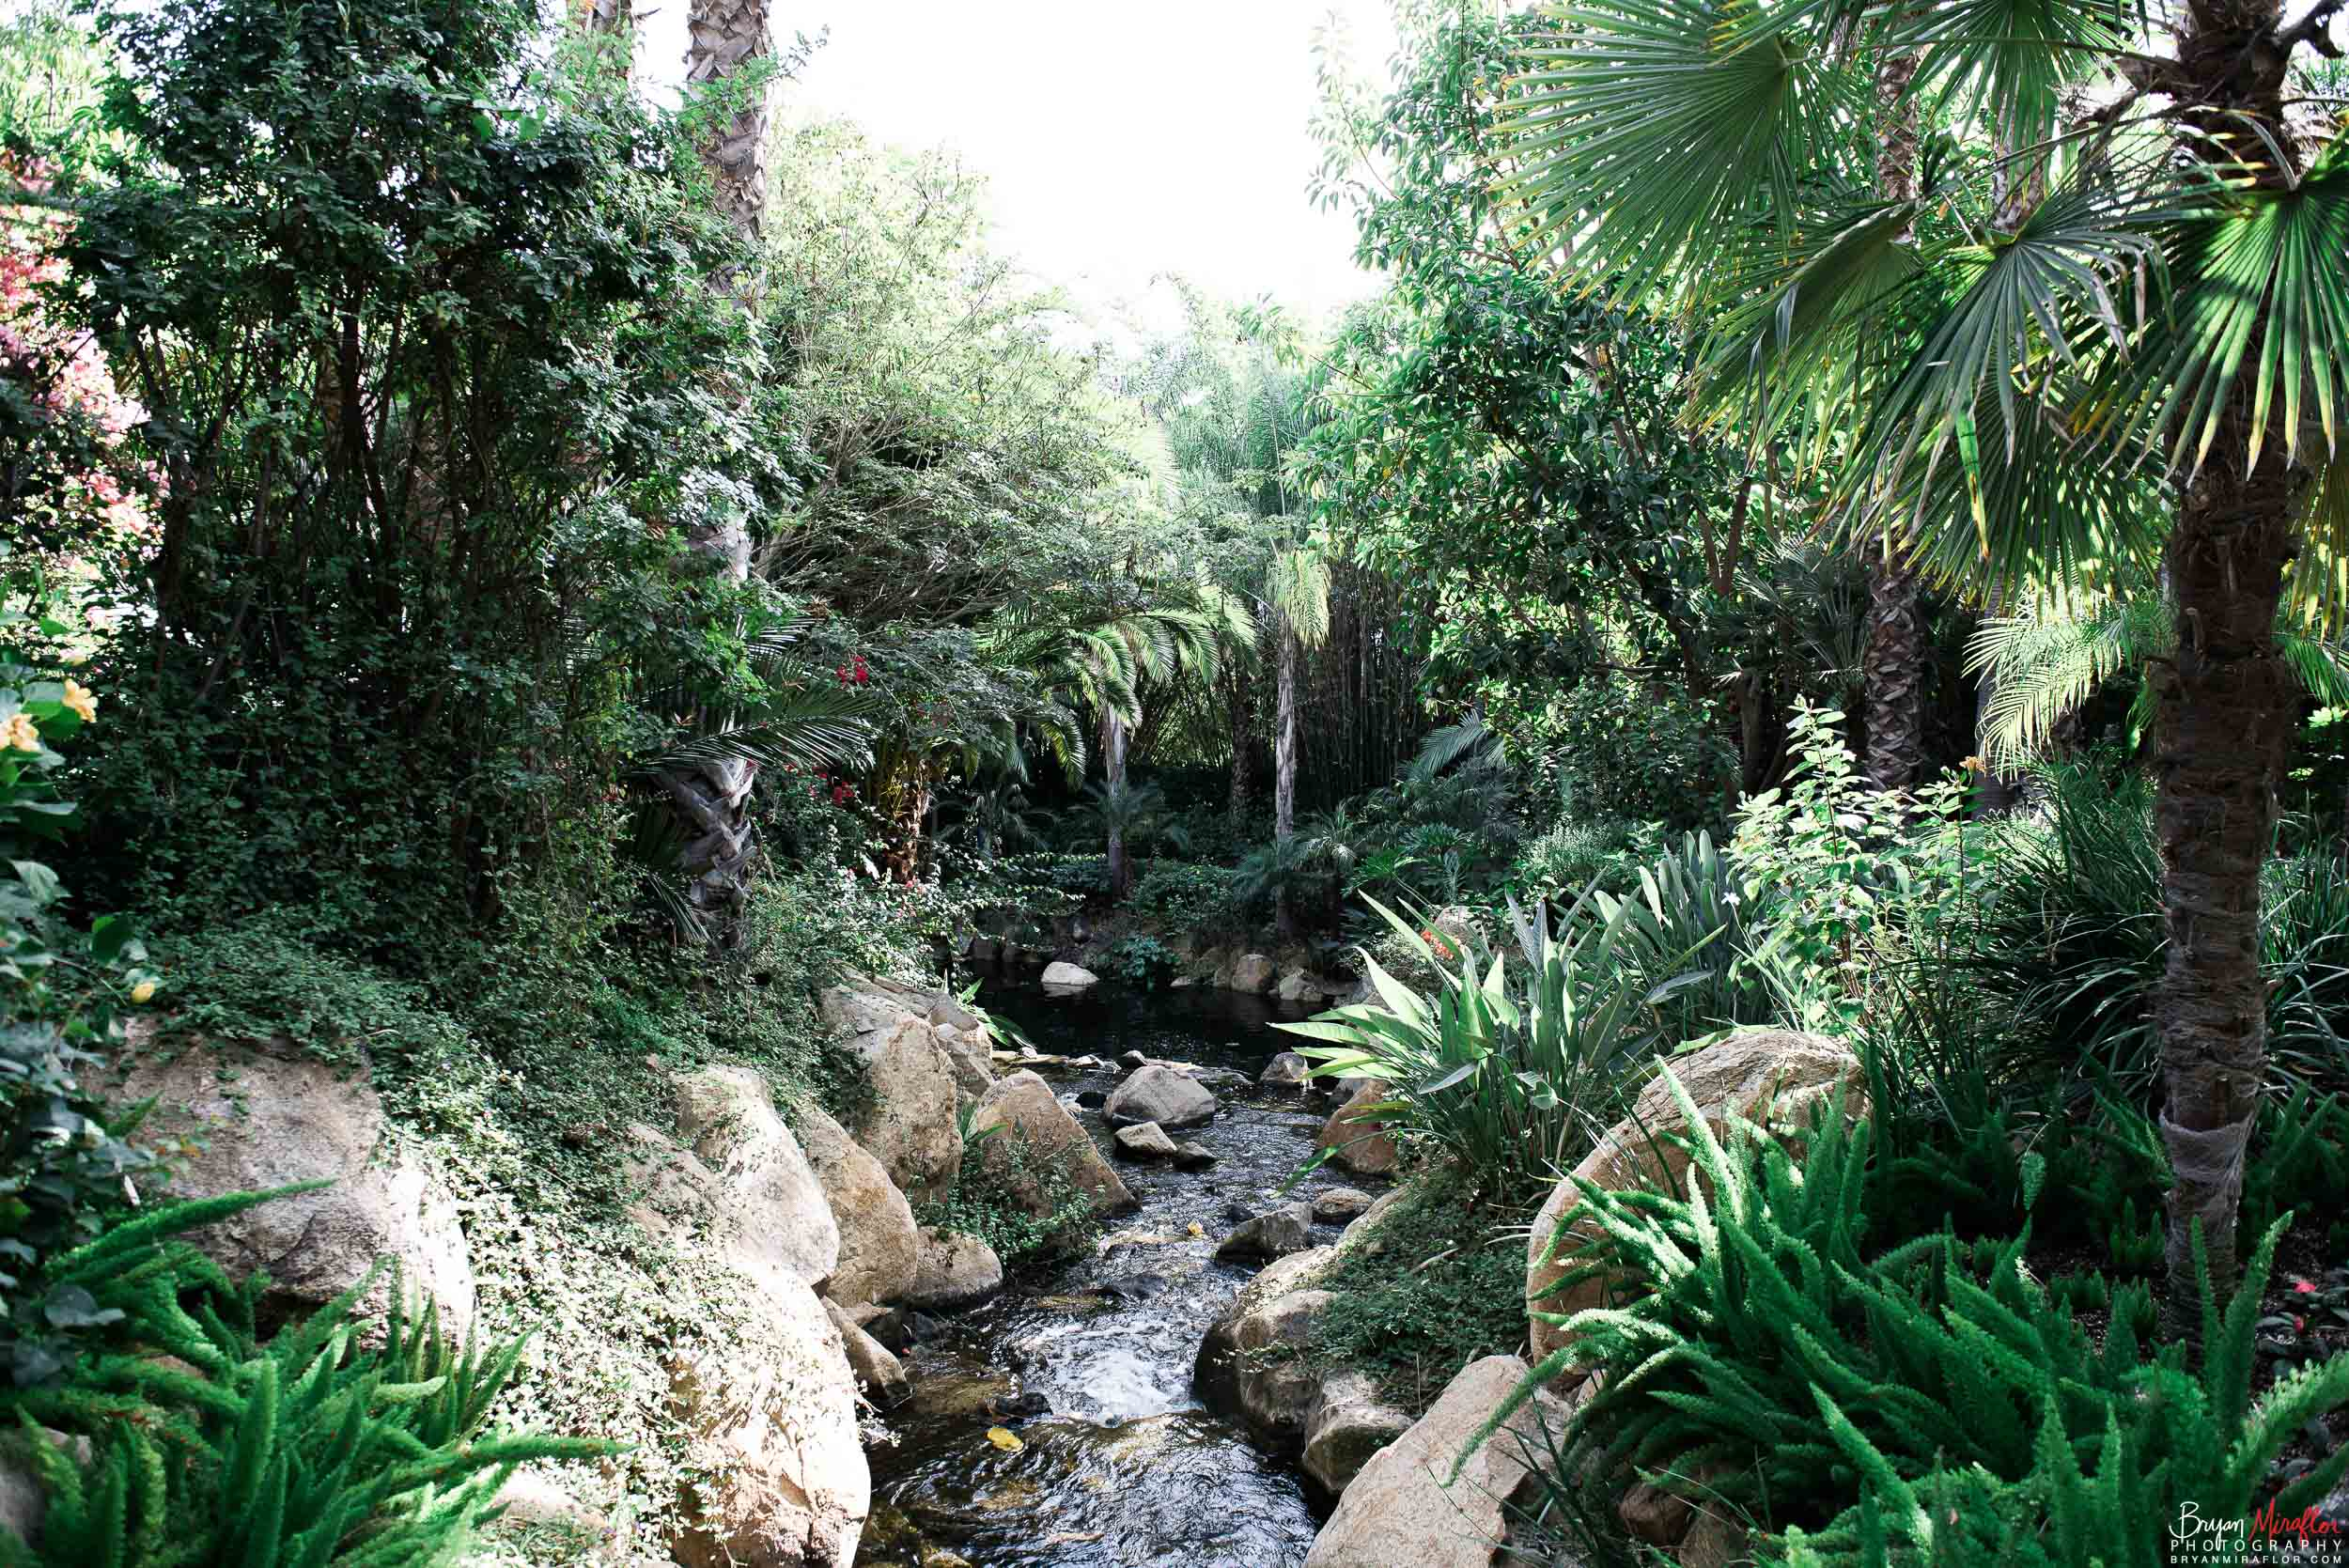 Bryan-Miraflor-Photography-Hannah-Jonathan-Married-Grand-Traditions-Estate-Gardens-Fallbrook-20171222-077.jpg